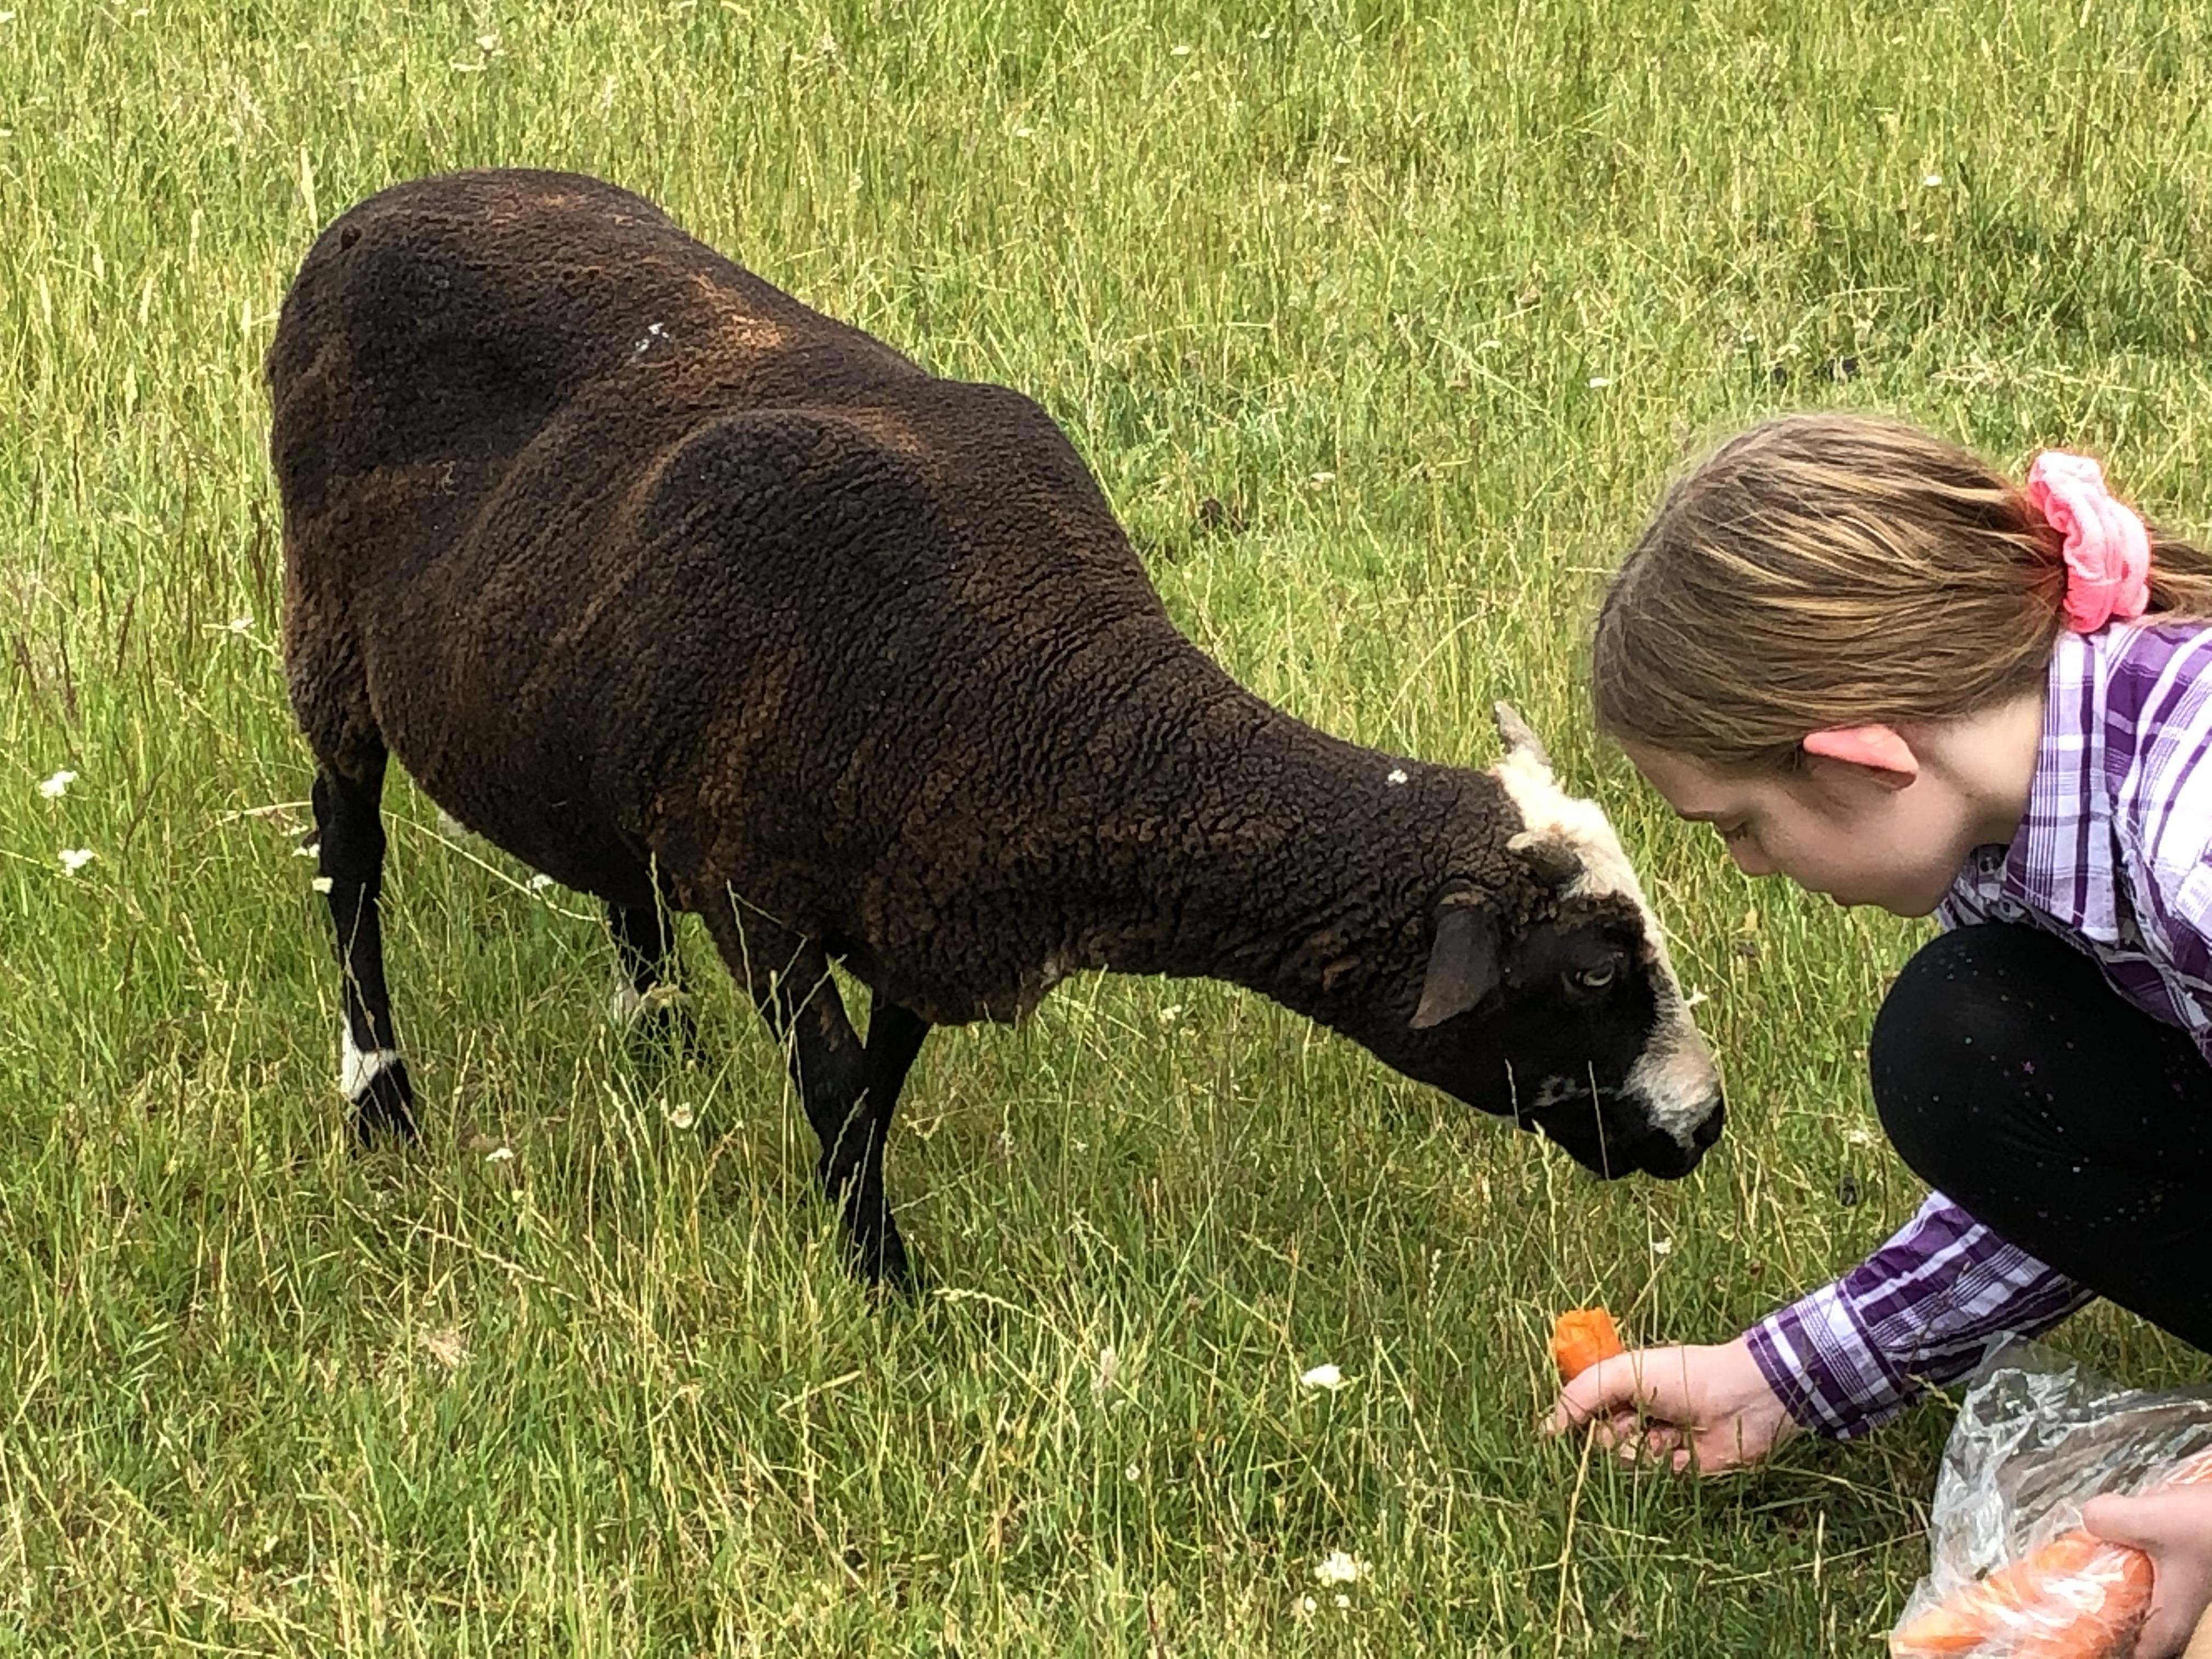 Feeding the sheep some carrots.